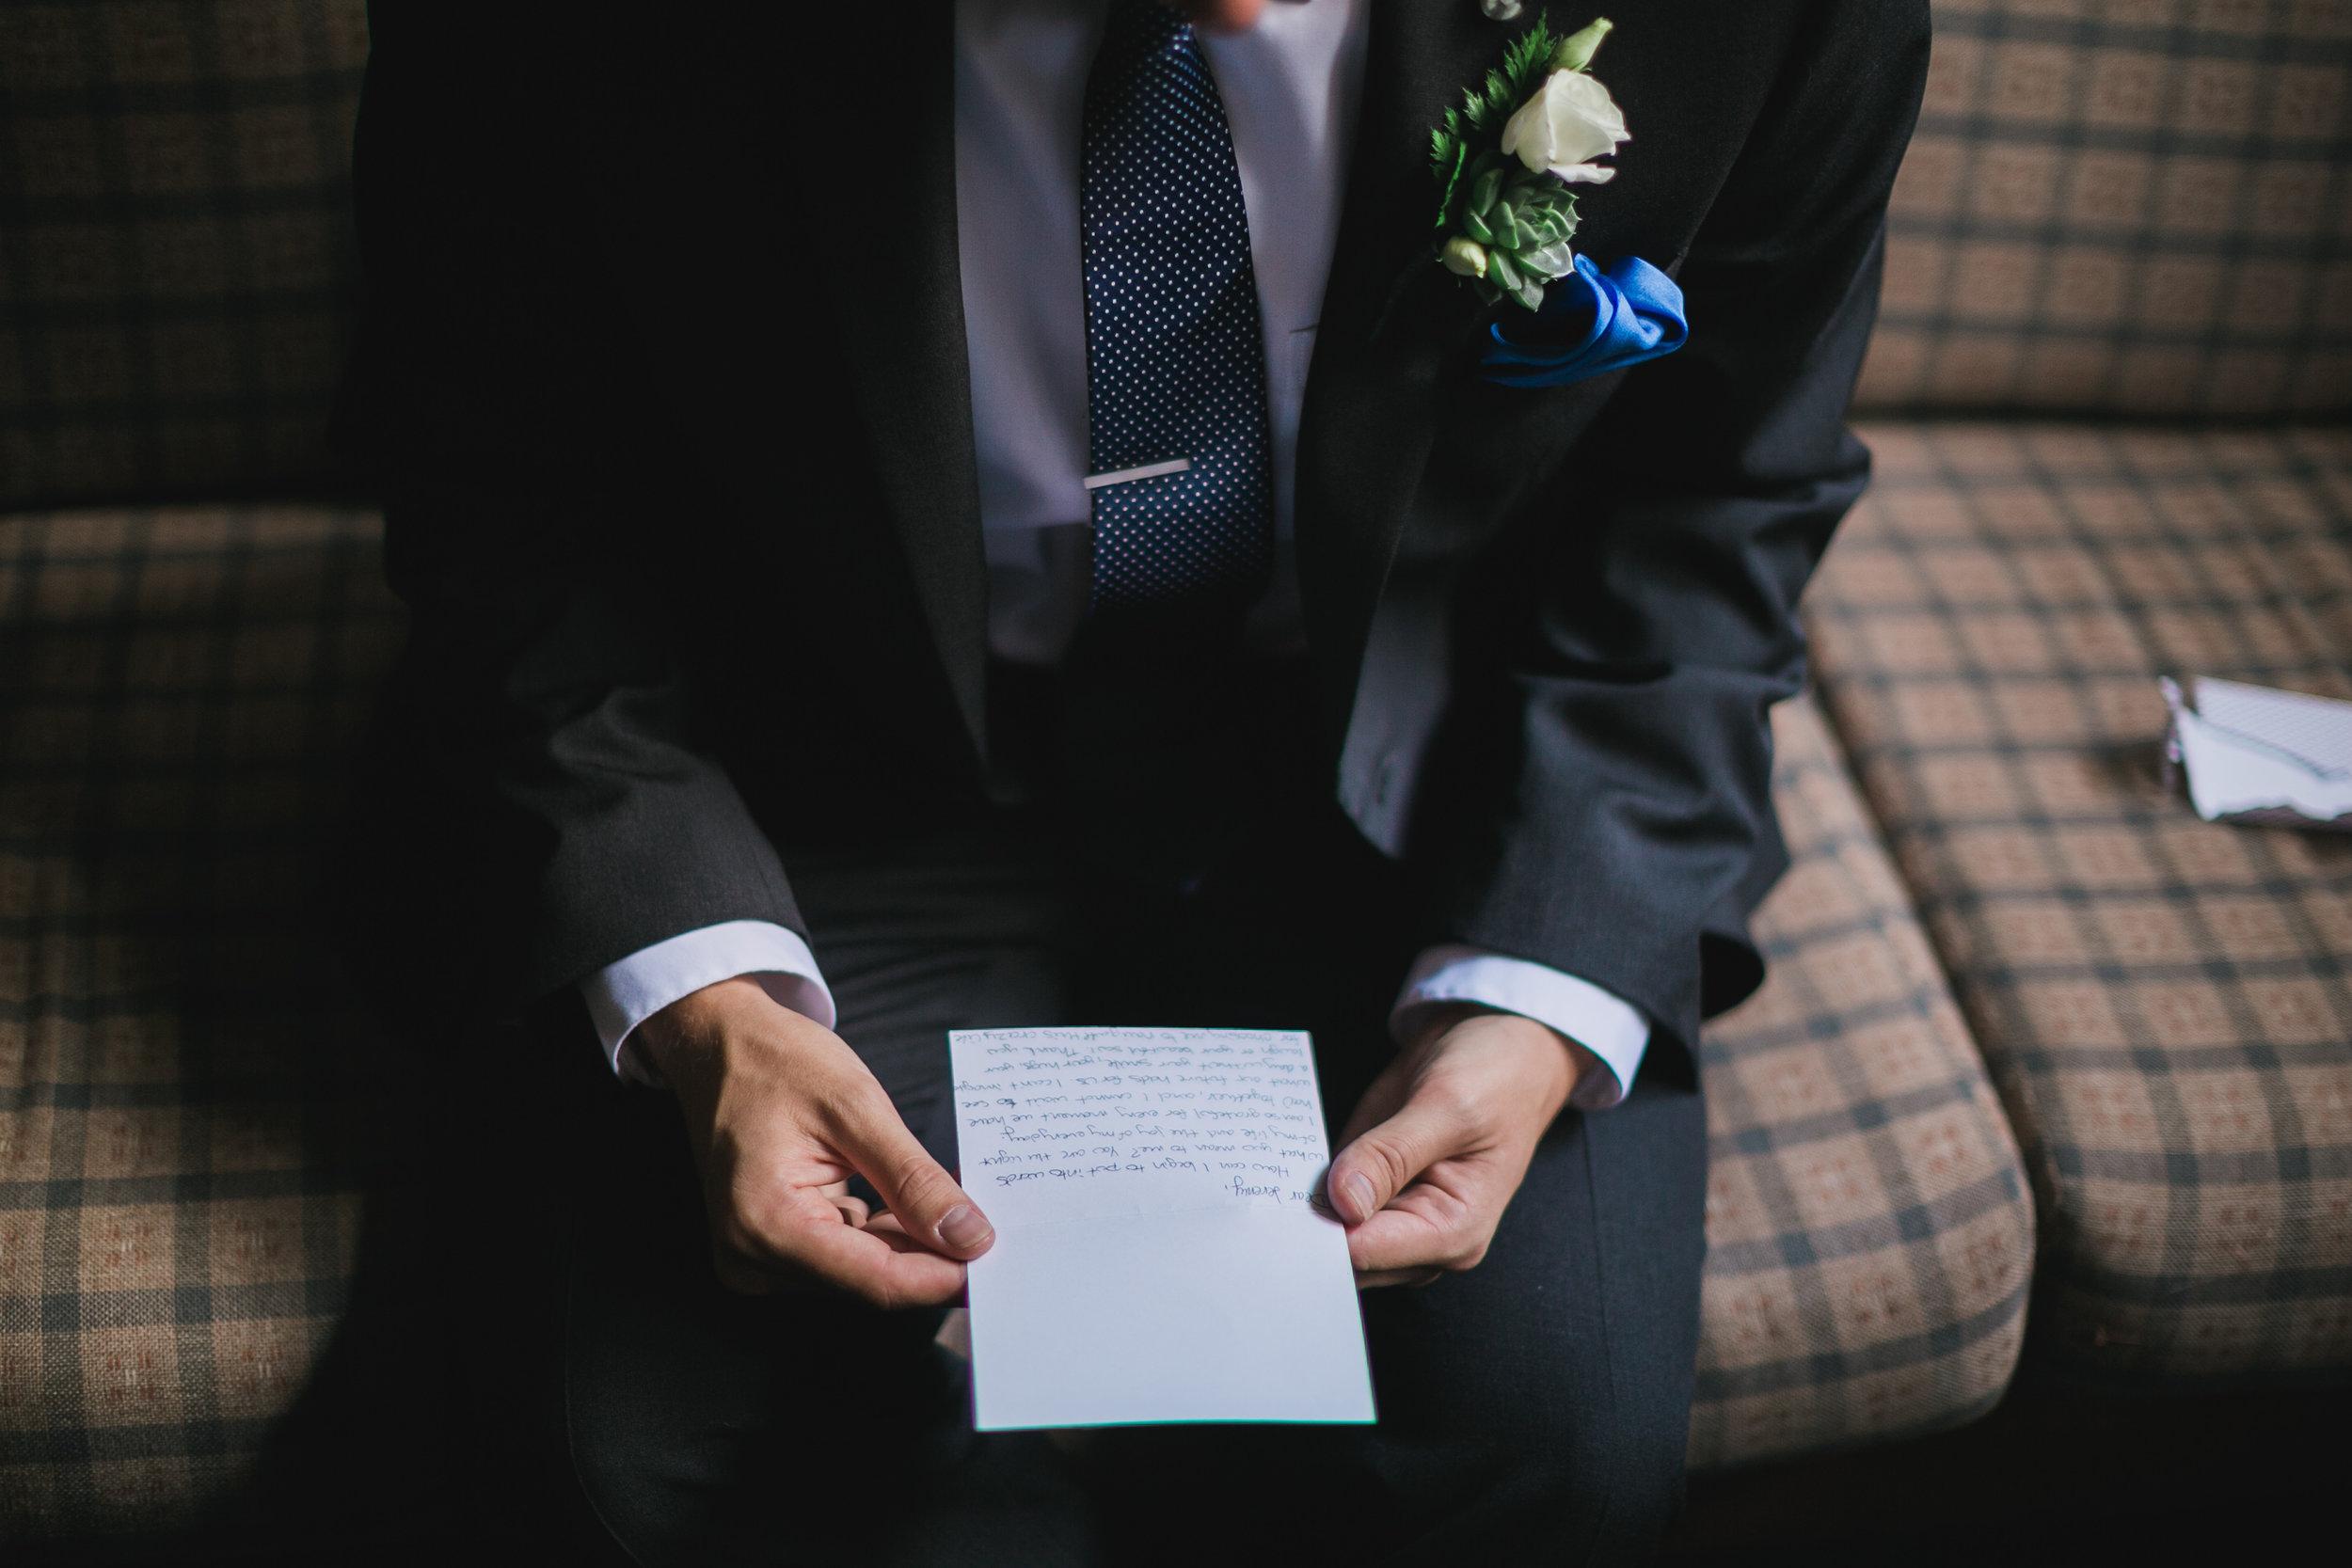 wisconsin-wedding-acowsay-uttke-photography-20.jpg